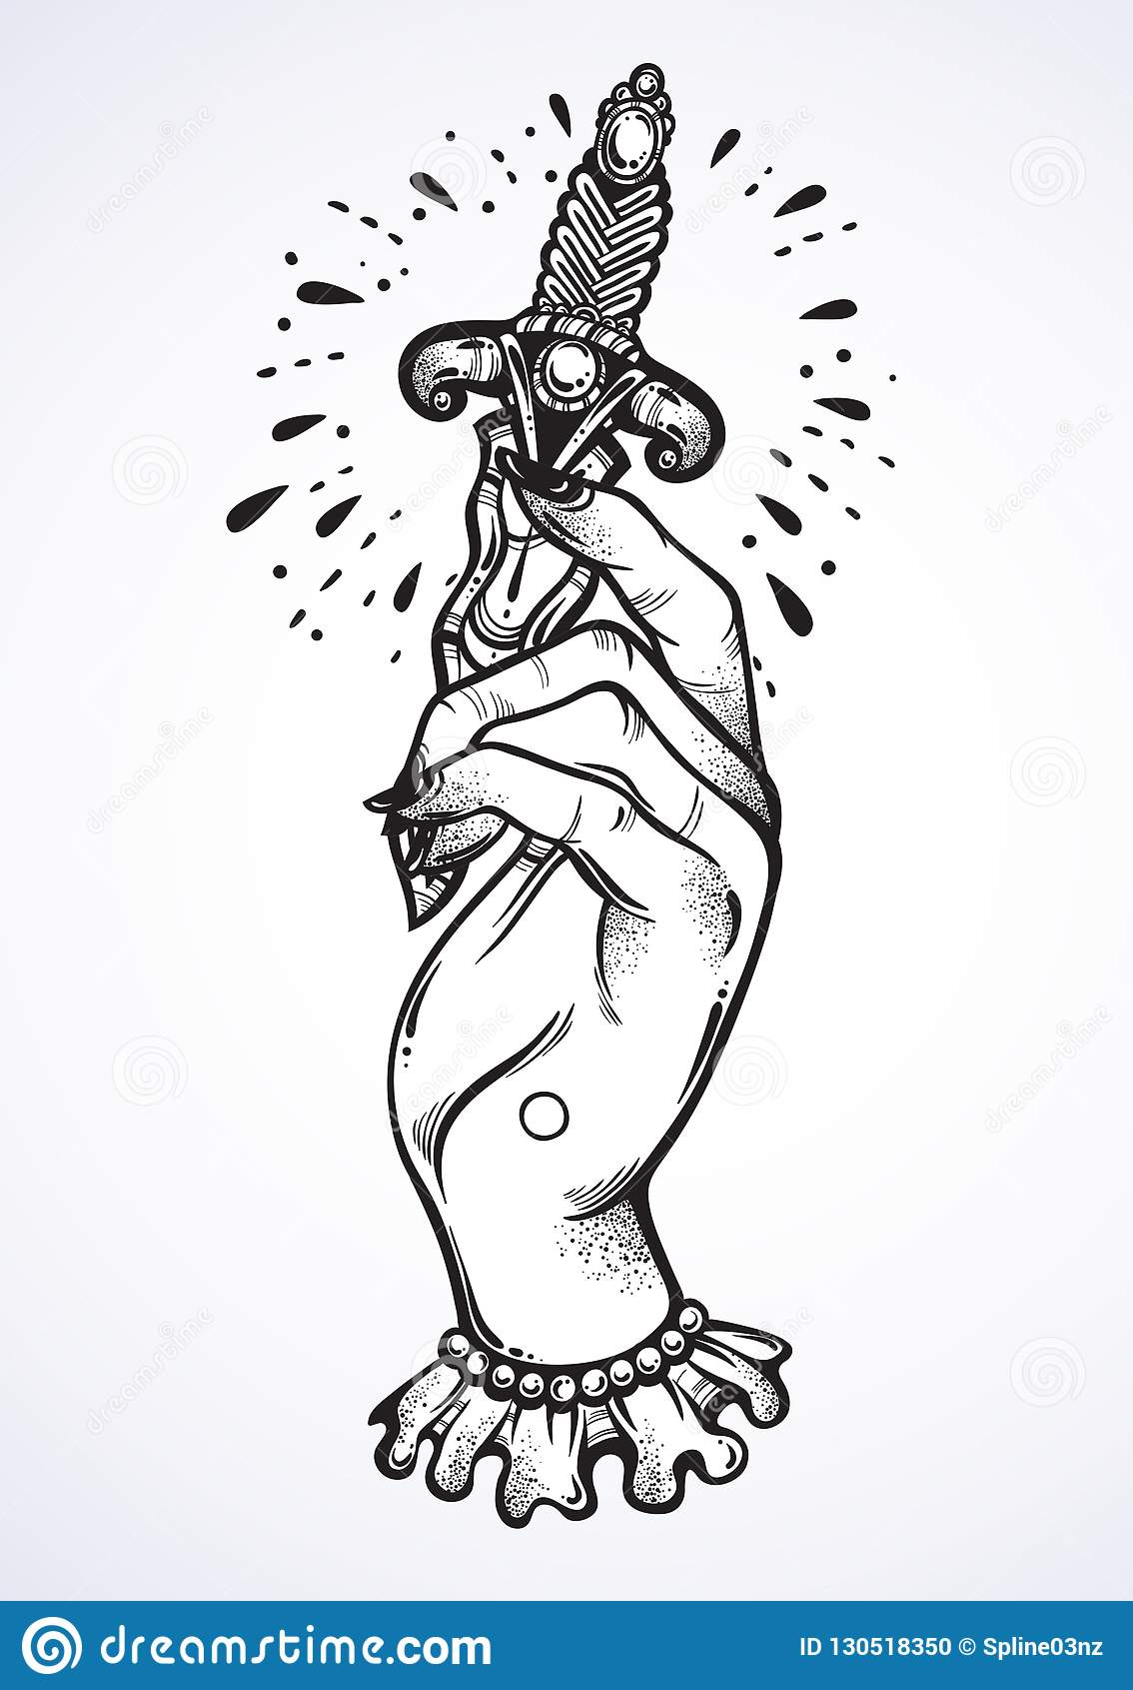 Diseno Hermoso Del Tatuaje Del Blackwork La Mano De La Mujer Del